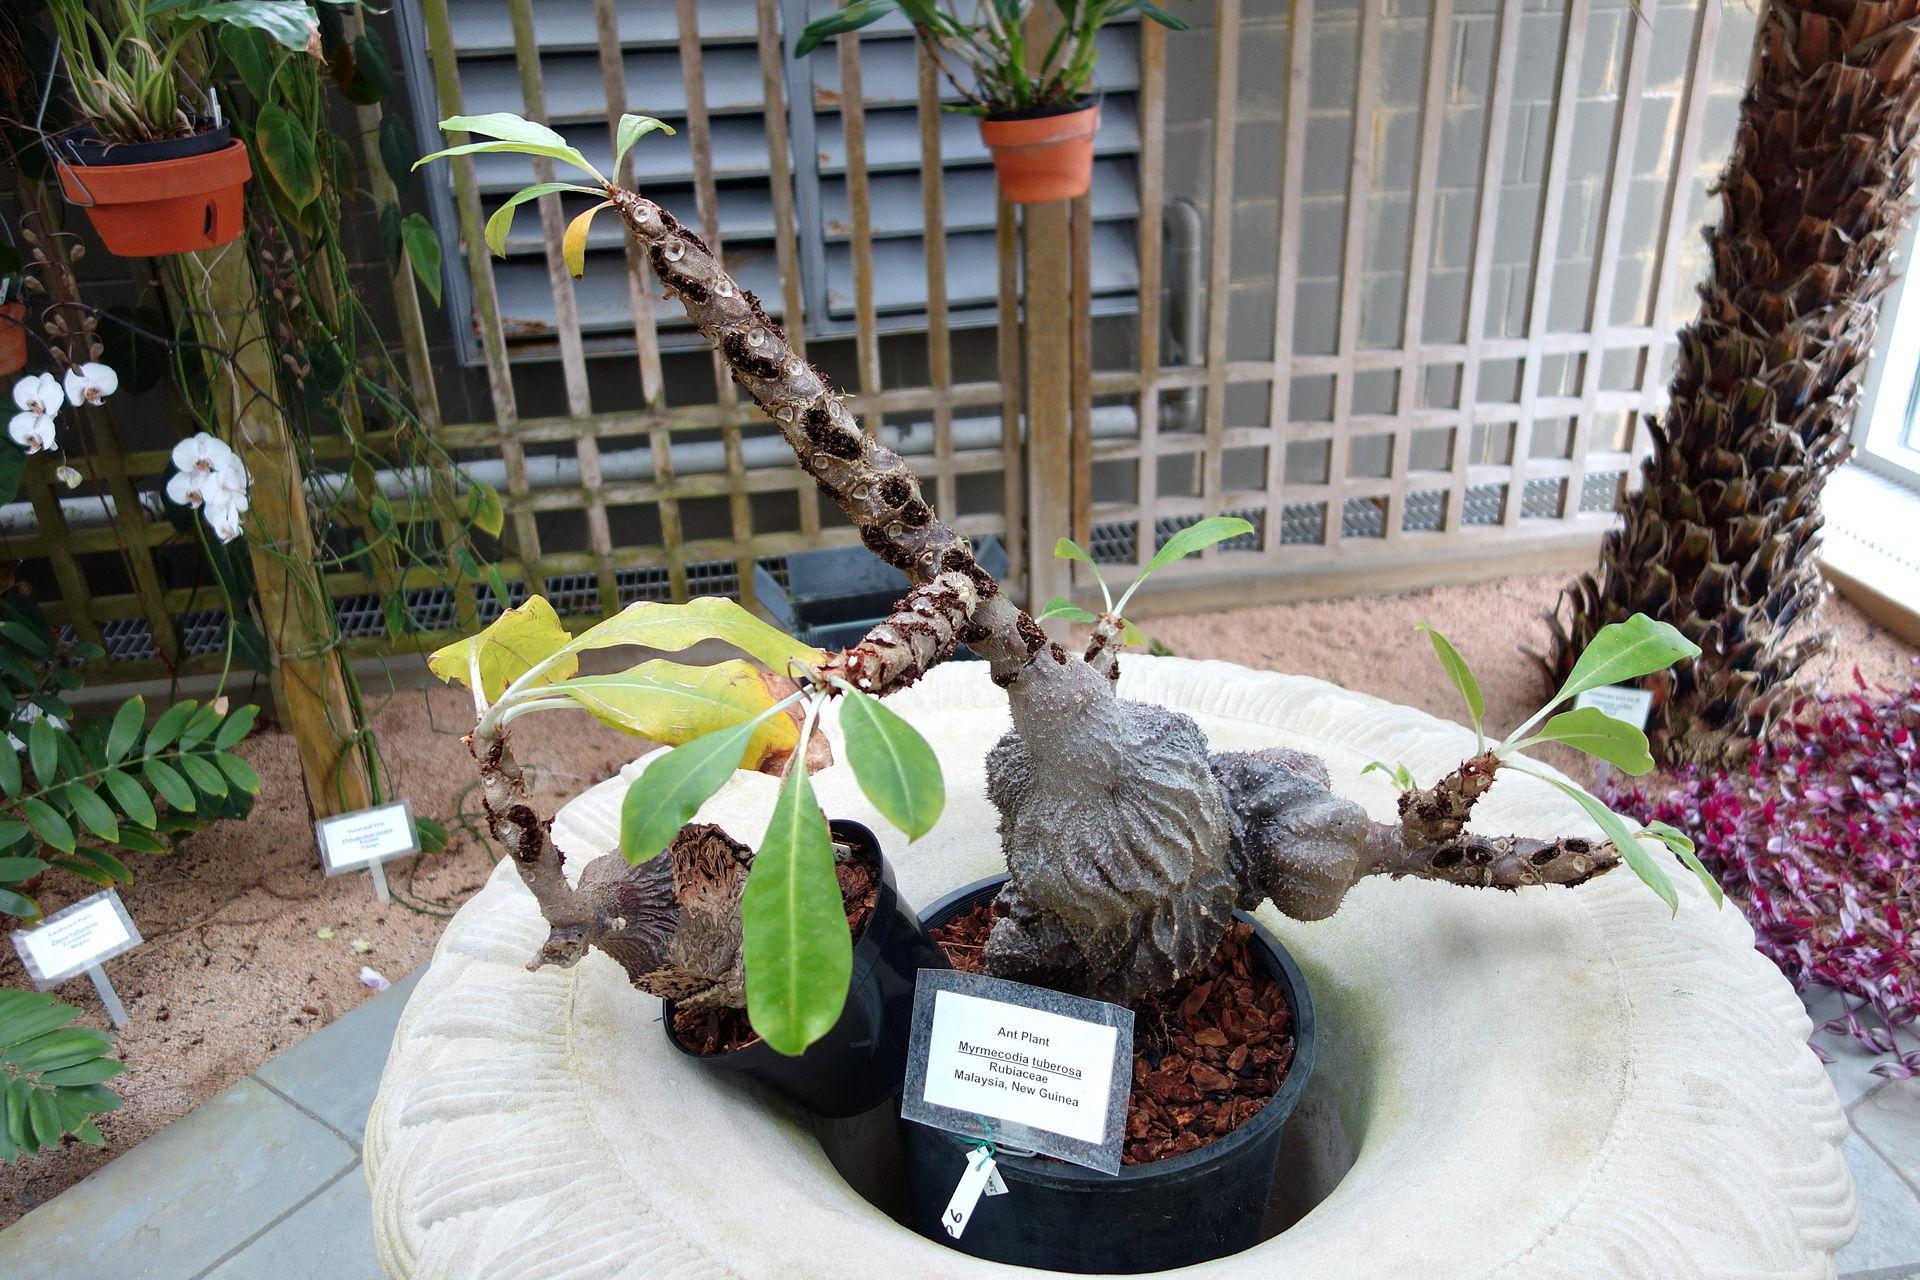 Ant Plant, Myrmecodia tuberosa